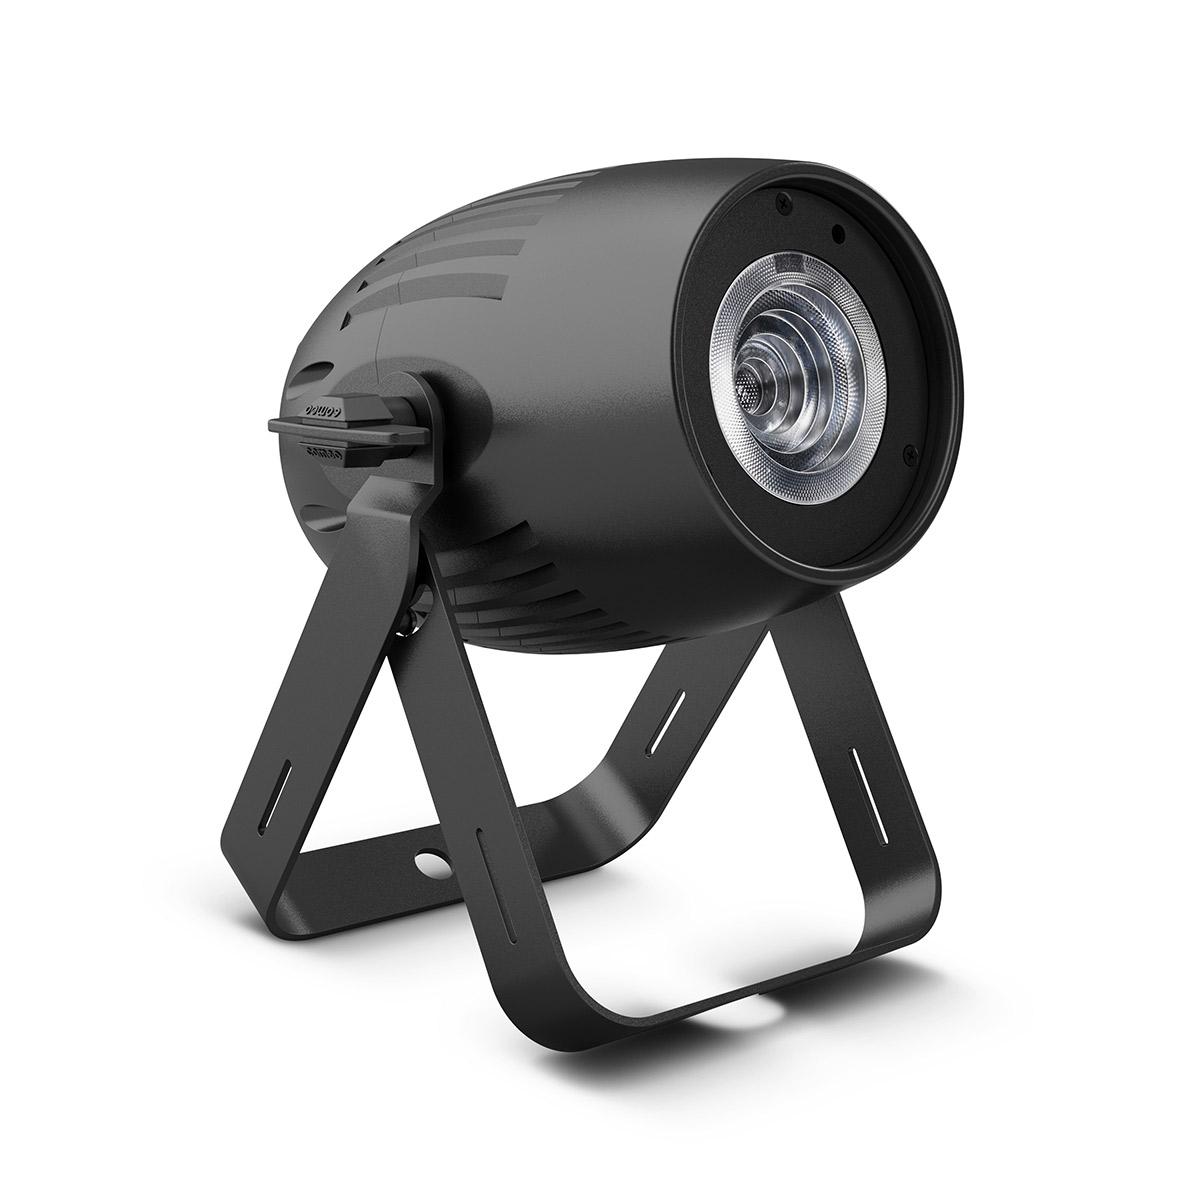 Cameo Q-SPOT 40 TW (BK) 白色 LED スポットライト 【 カメオ】